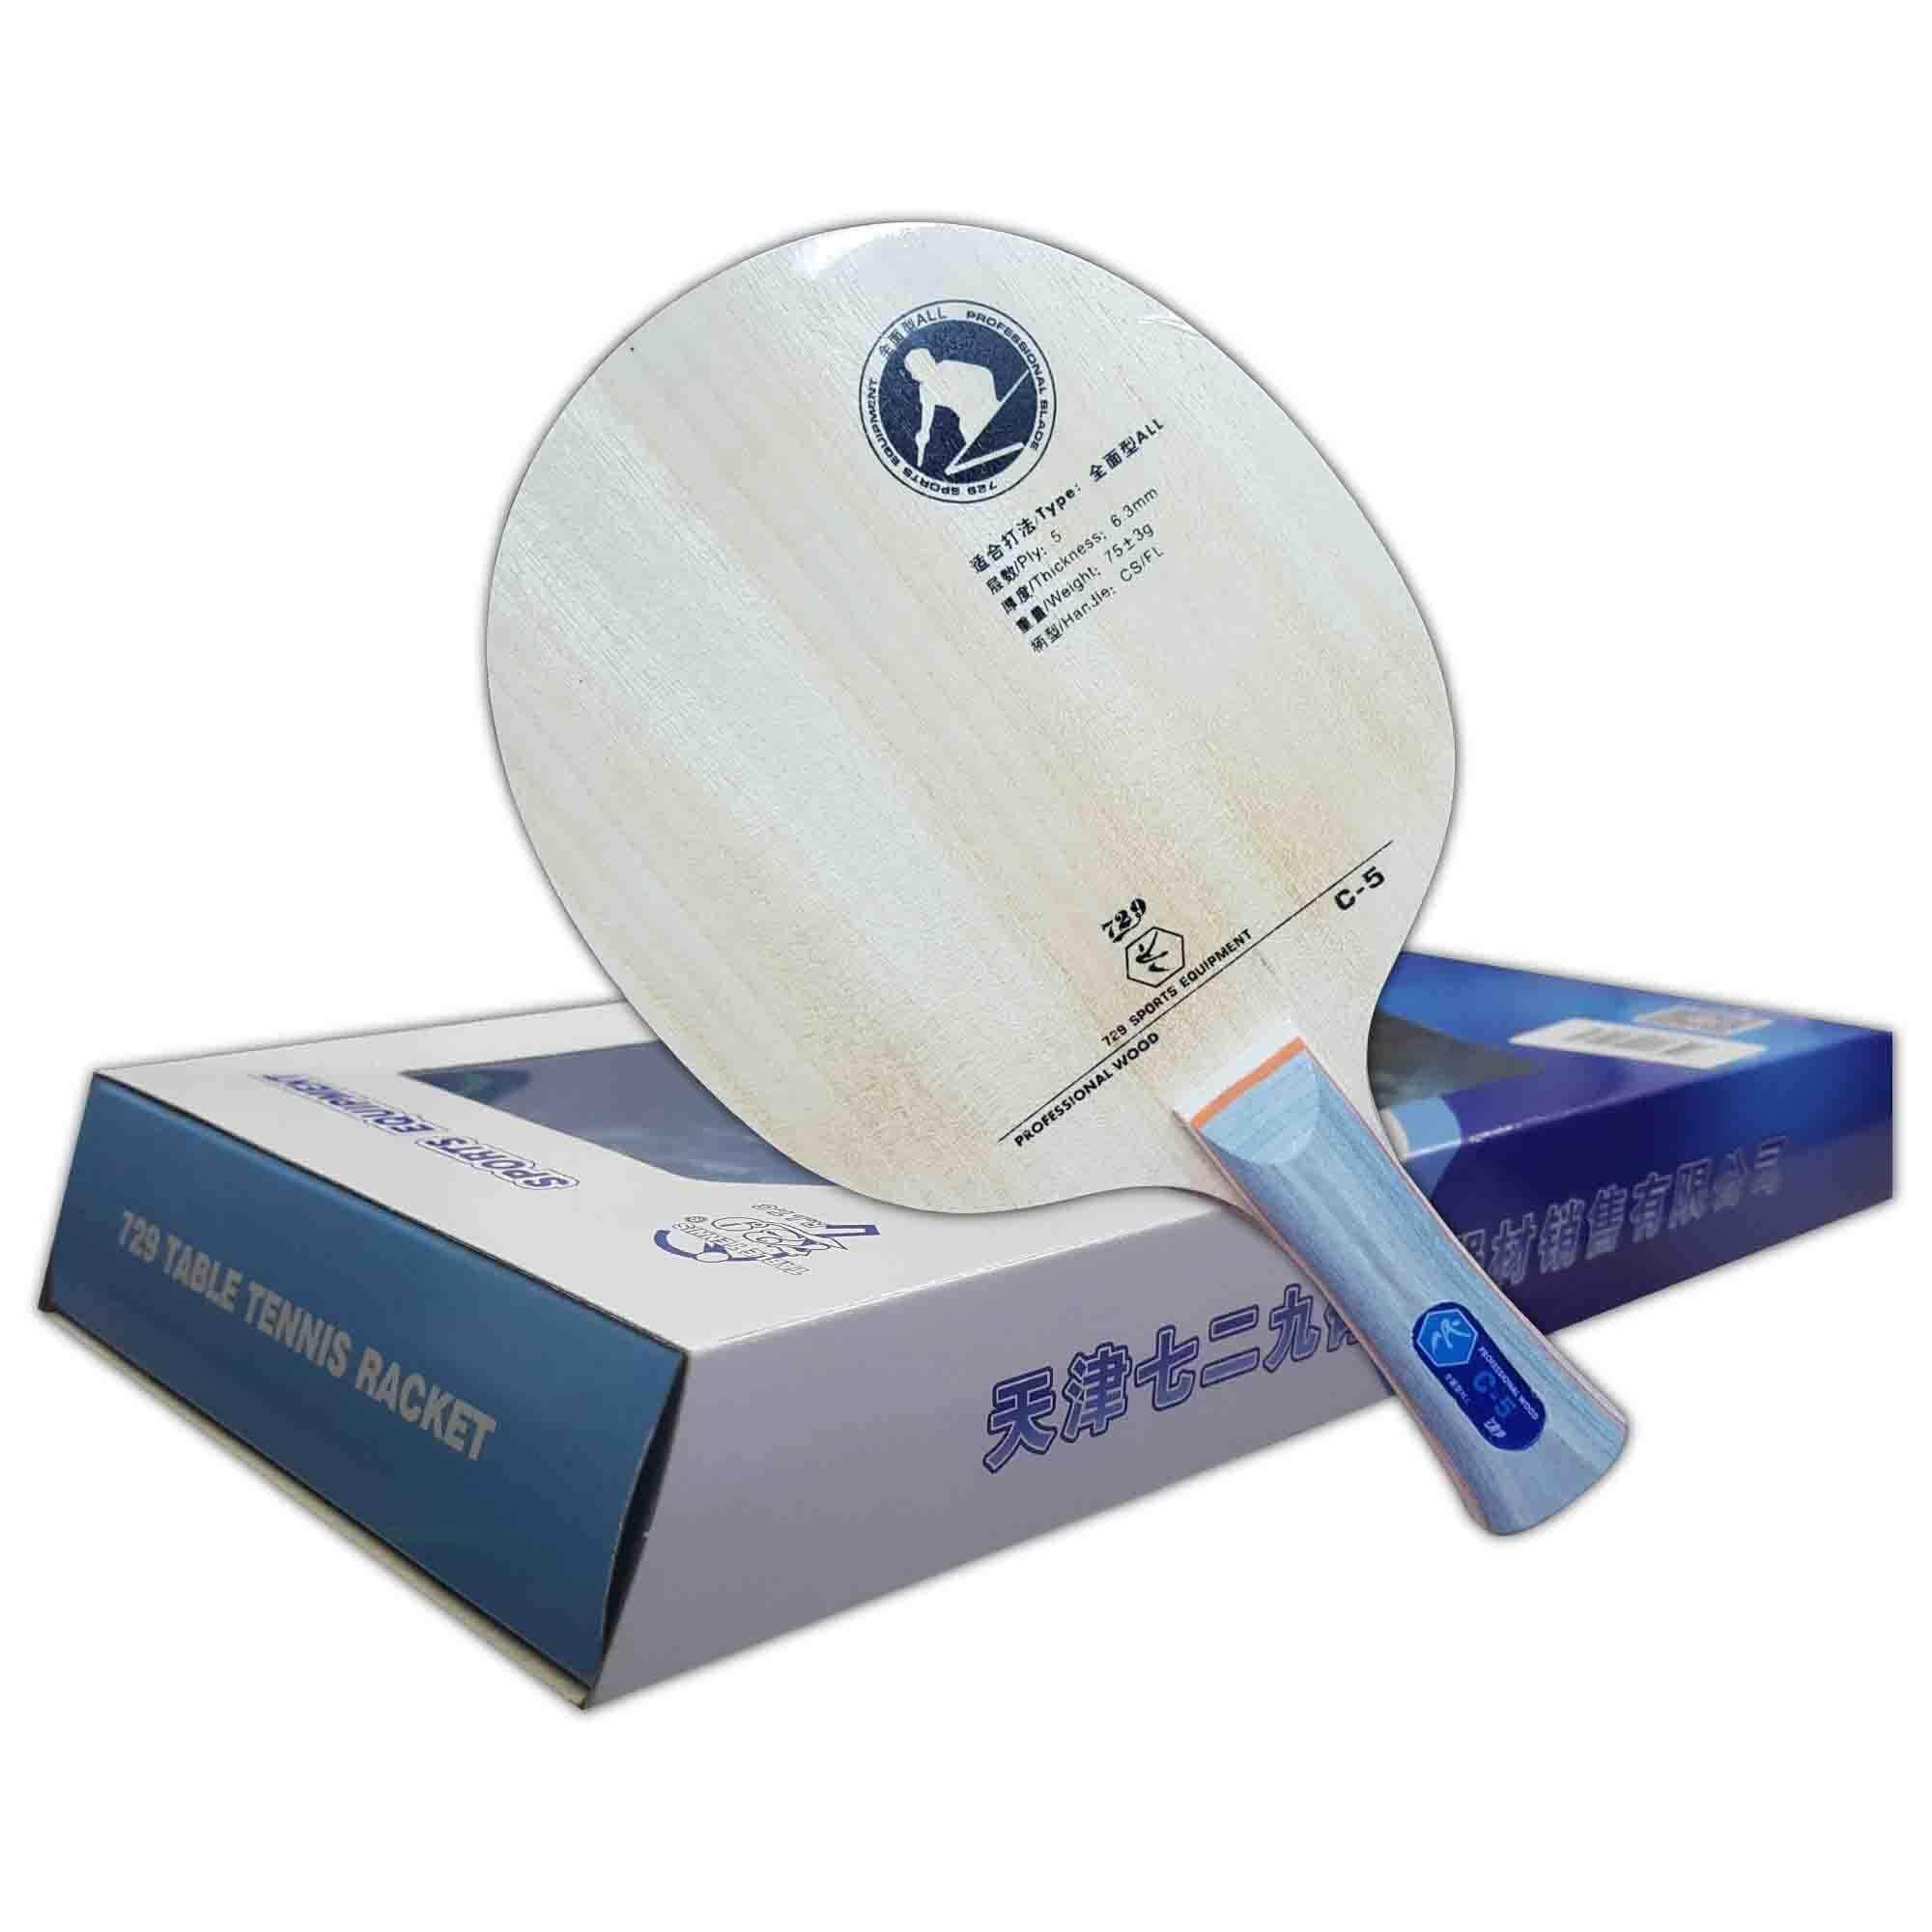 729 Friendship 5 Ply Wood Table Tennis Bat C-5